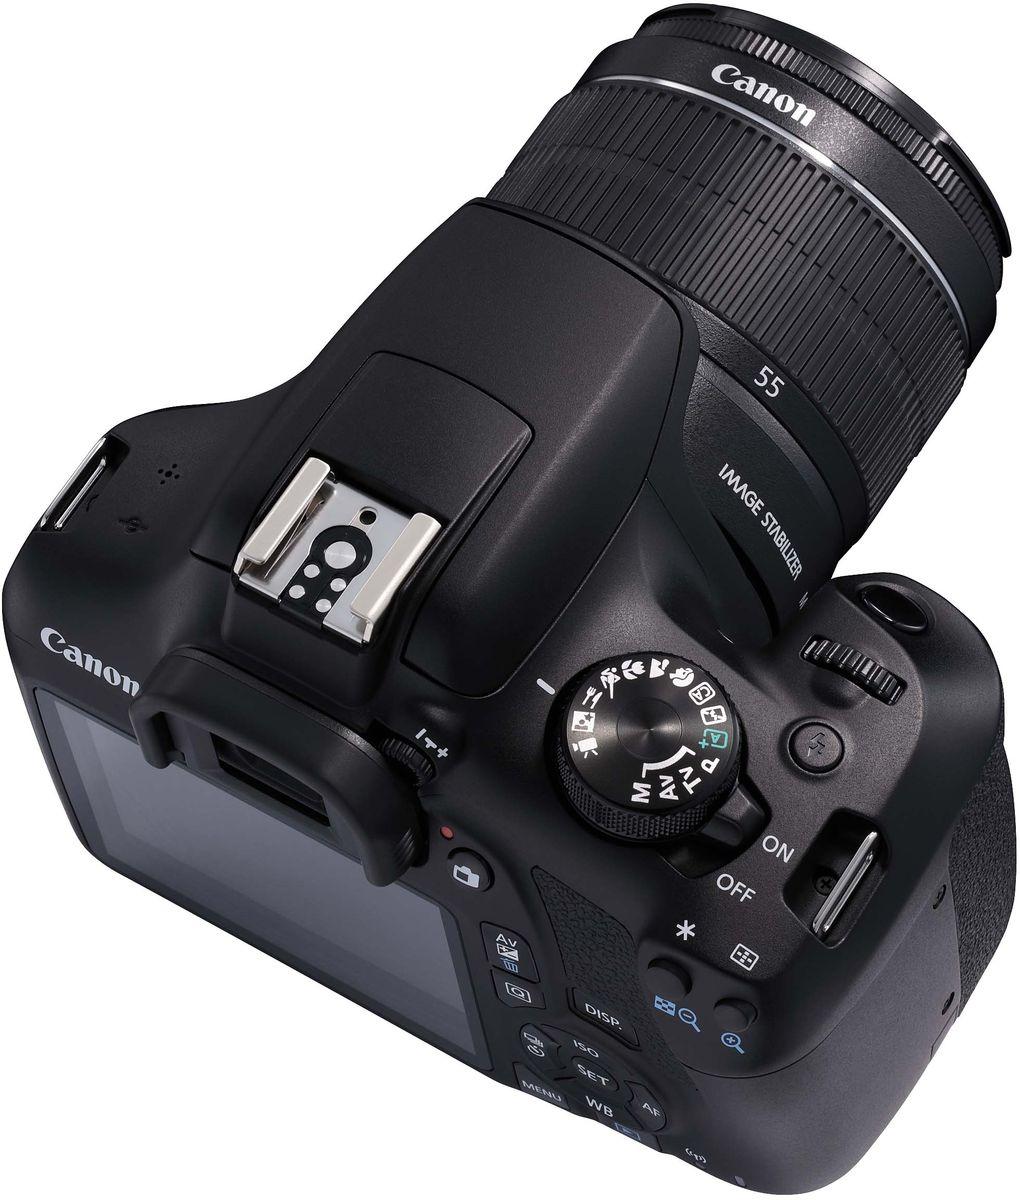 Canon EOS 1300D Kit 18-55 IS II цифровая зеркальная фотокамера